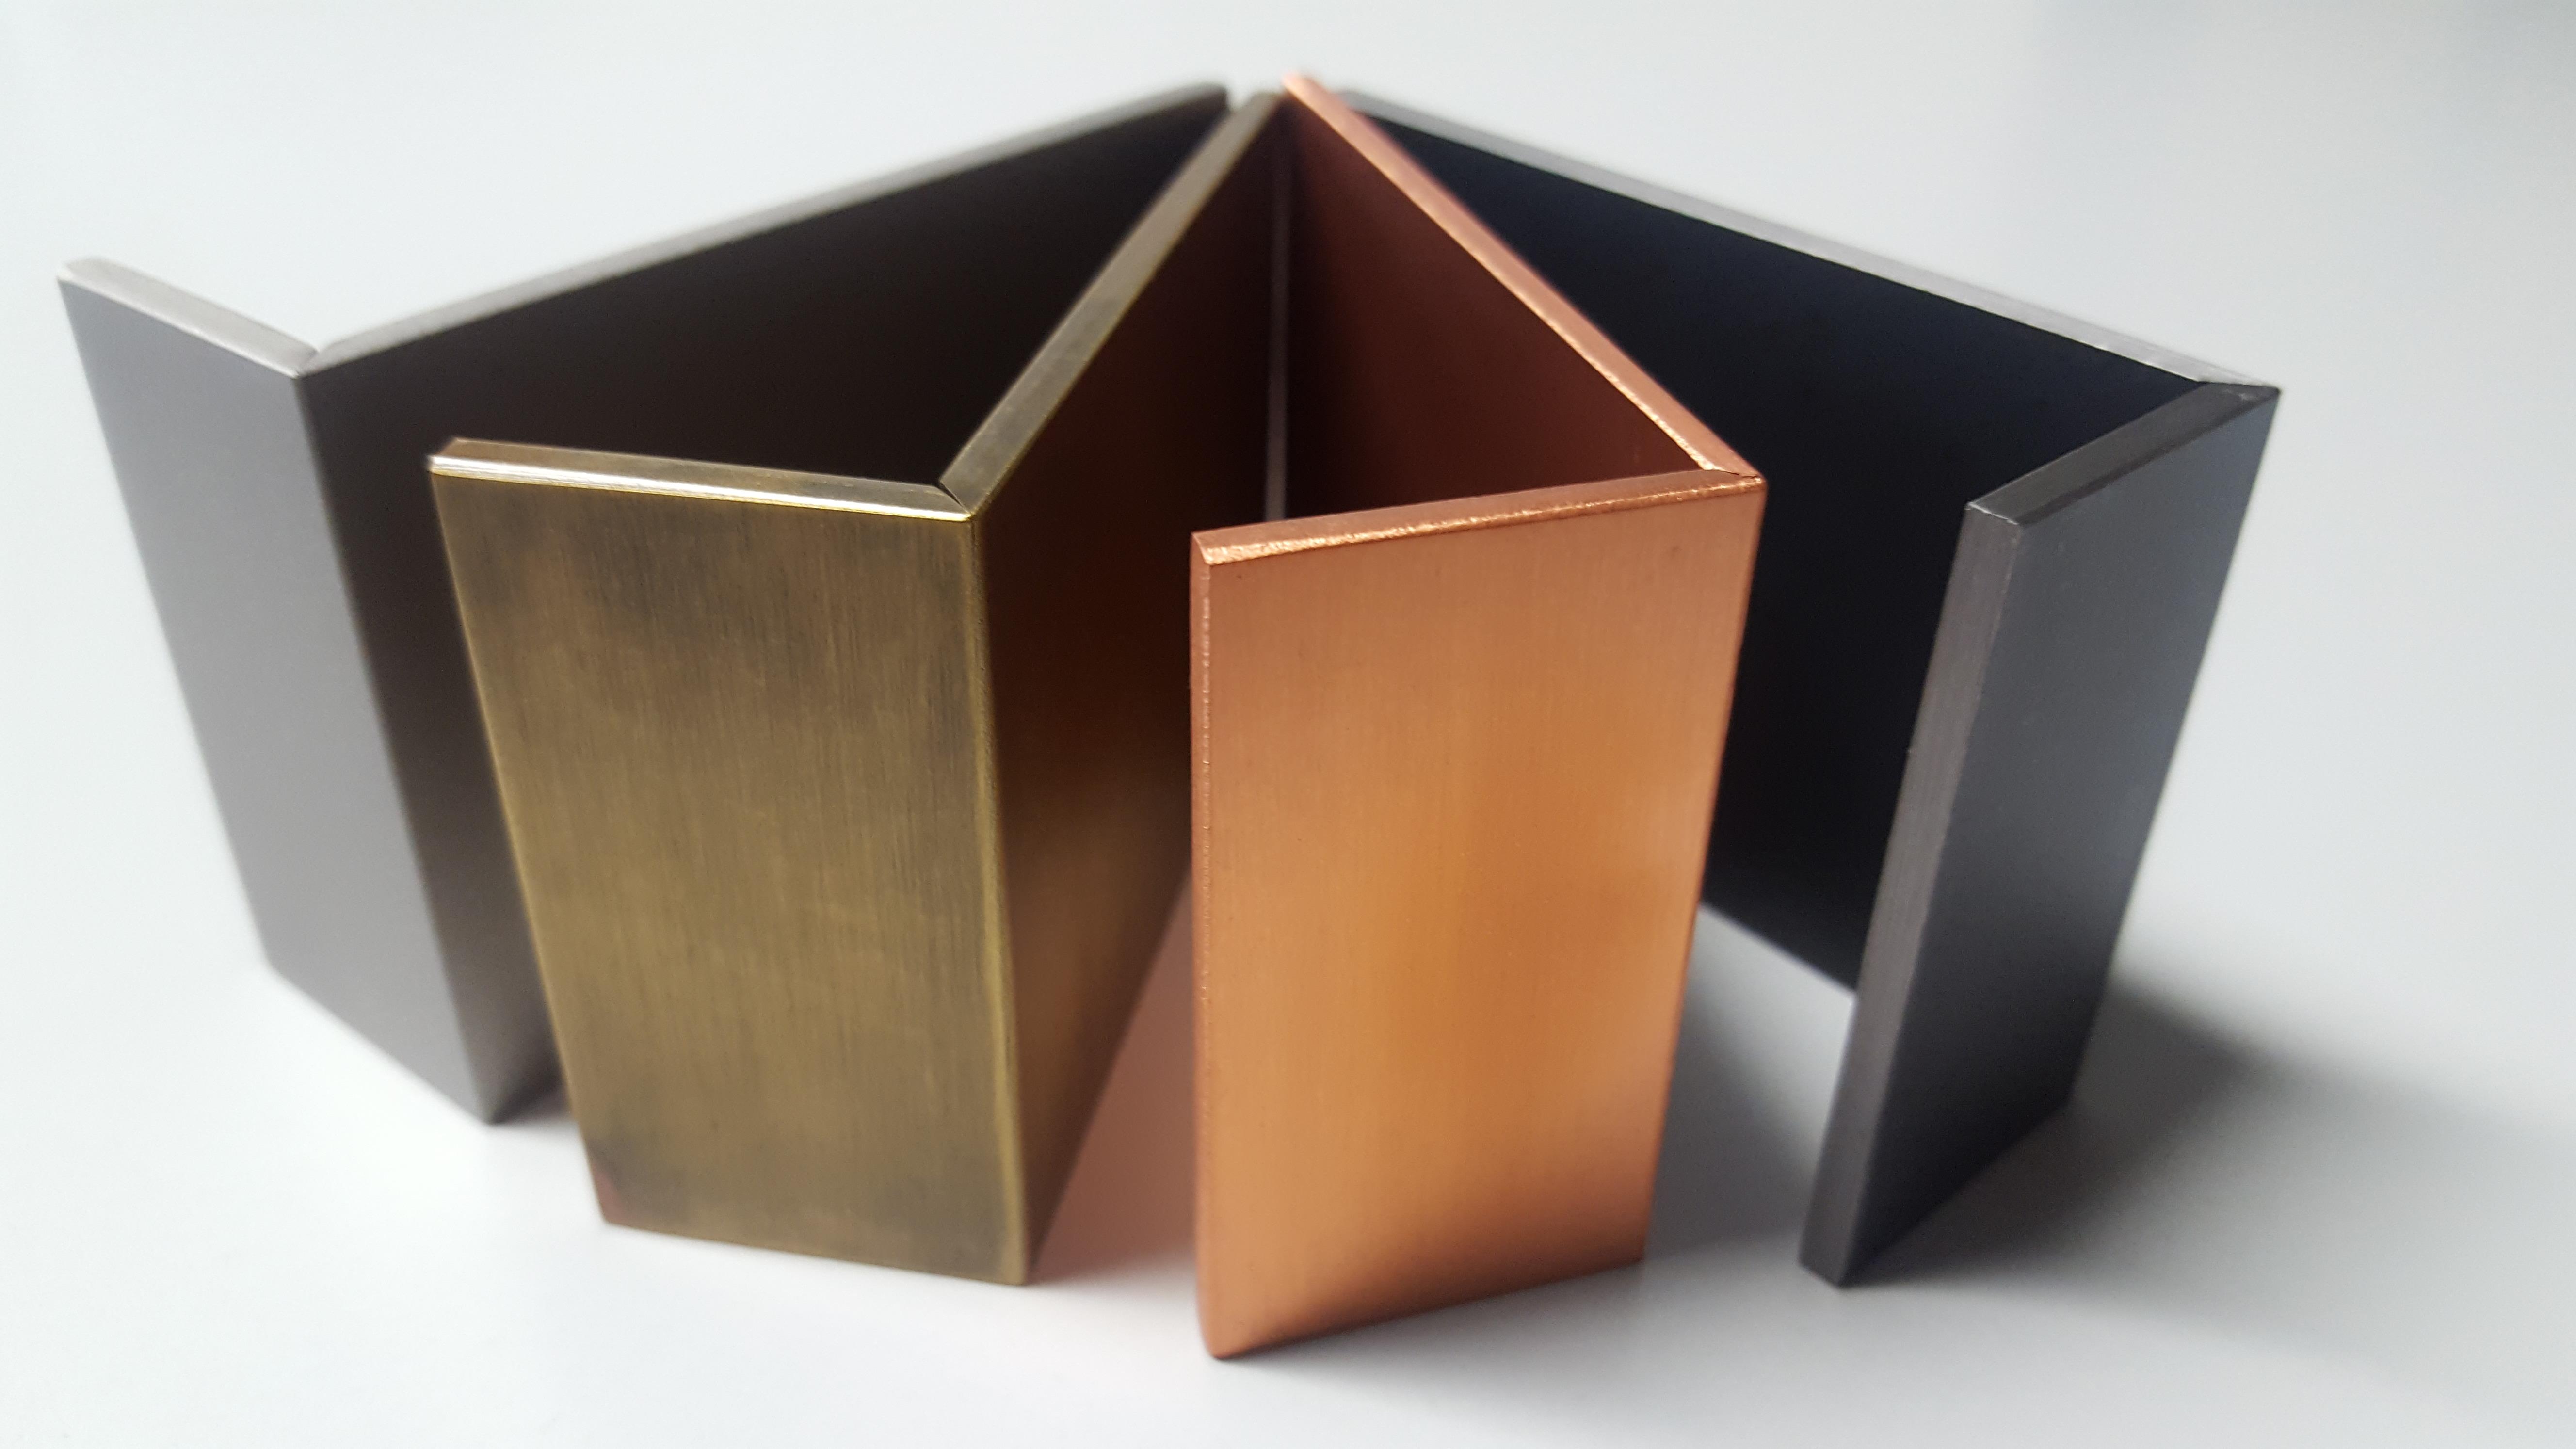 Piegatura - Folding